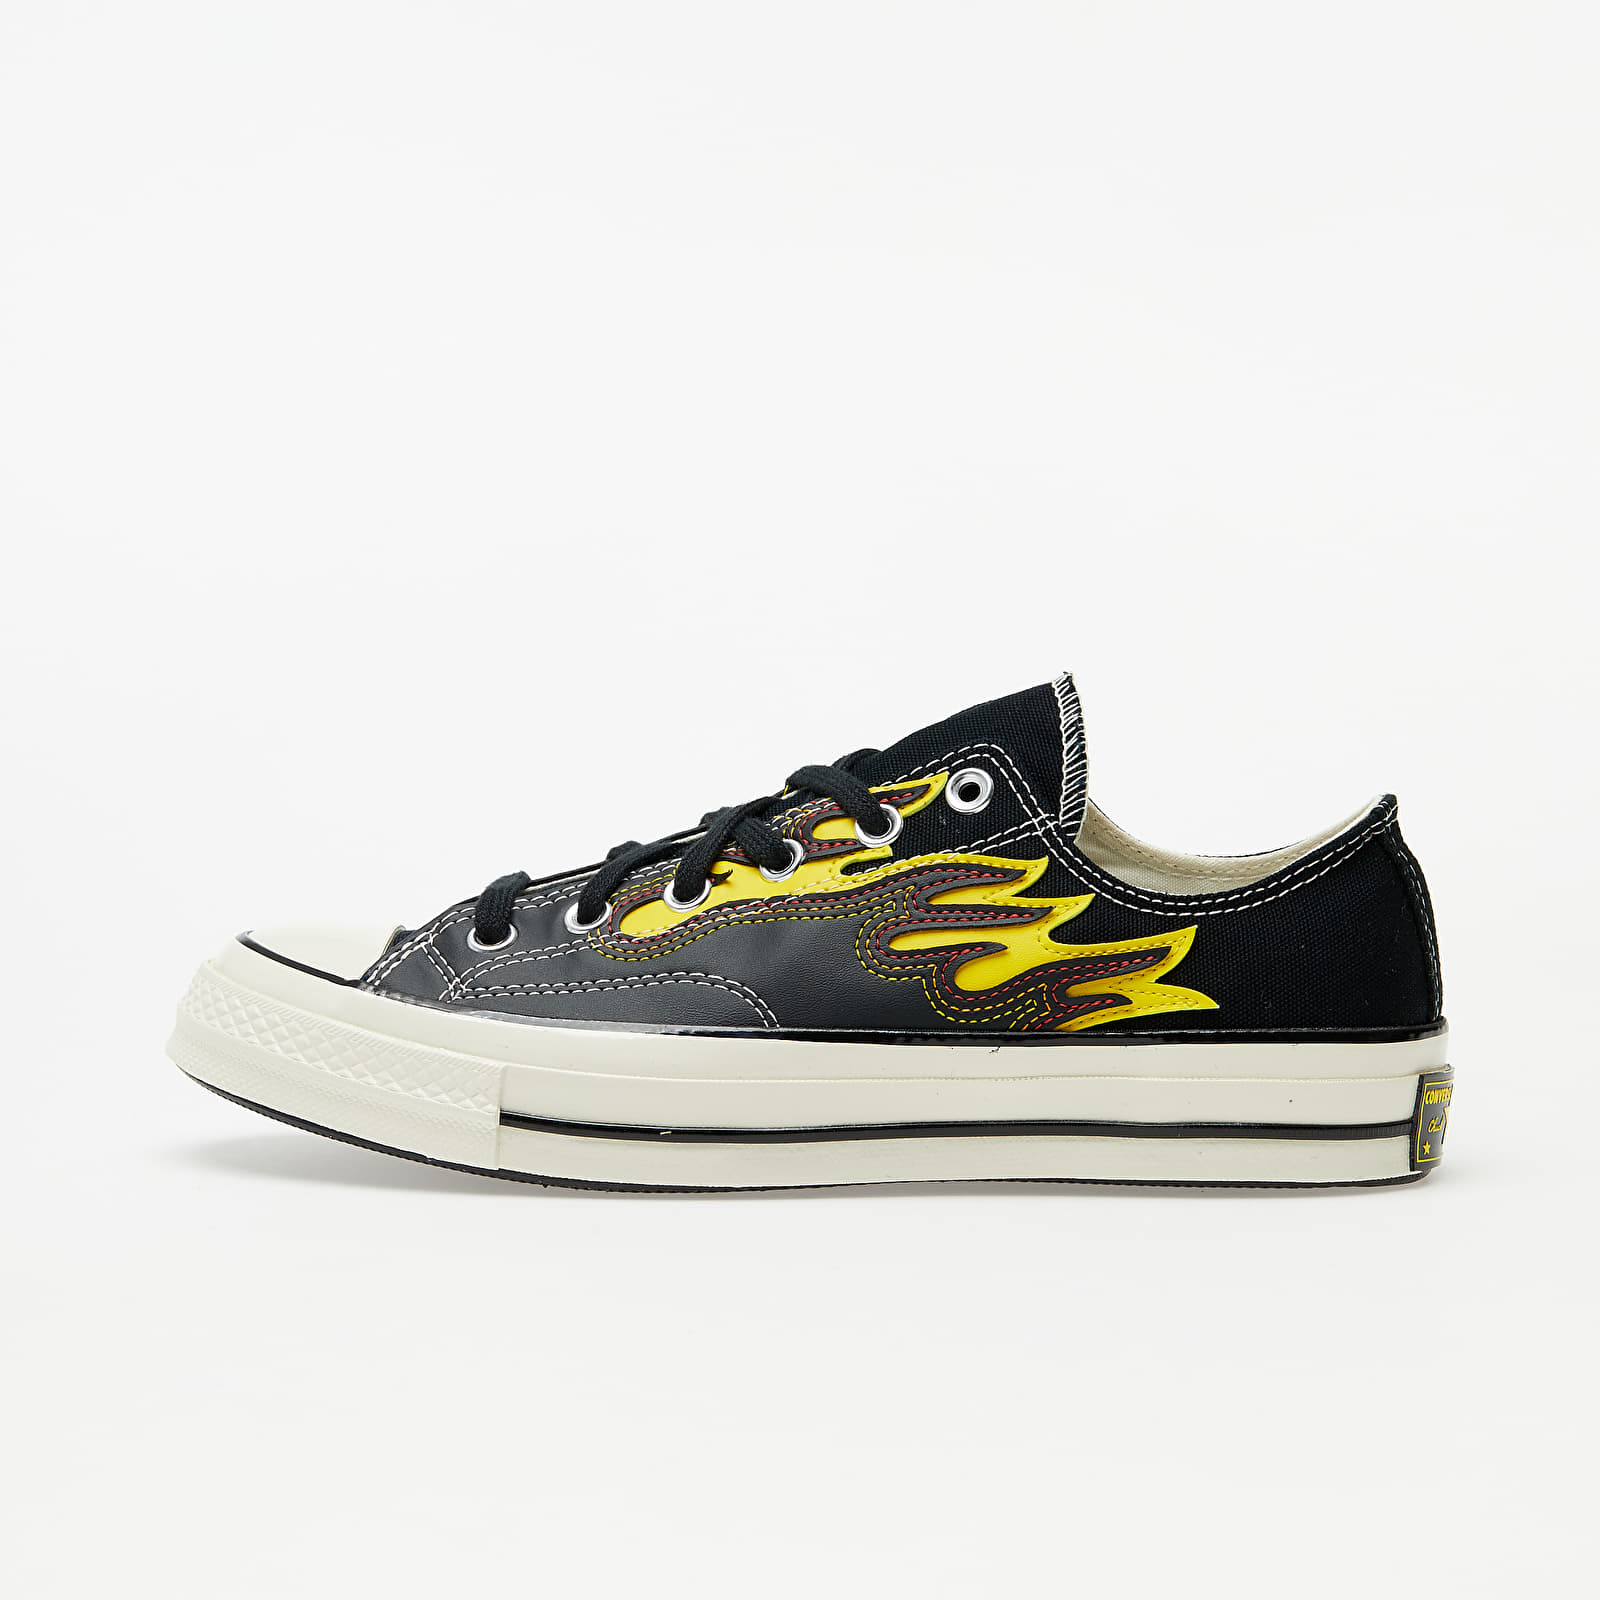 Converse Chuck Taylor All Star 70 Ox Black/ Speed Yellow/ Egret EUR 44.5